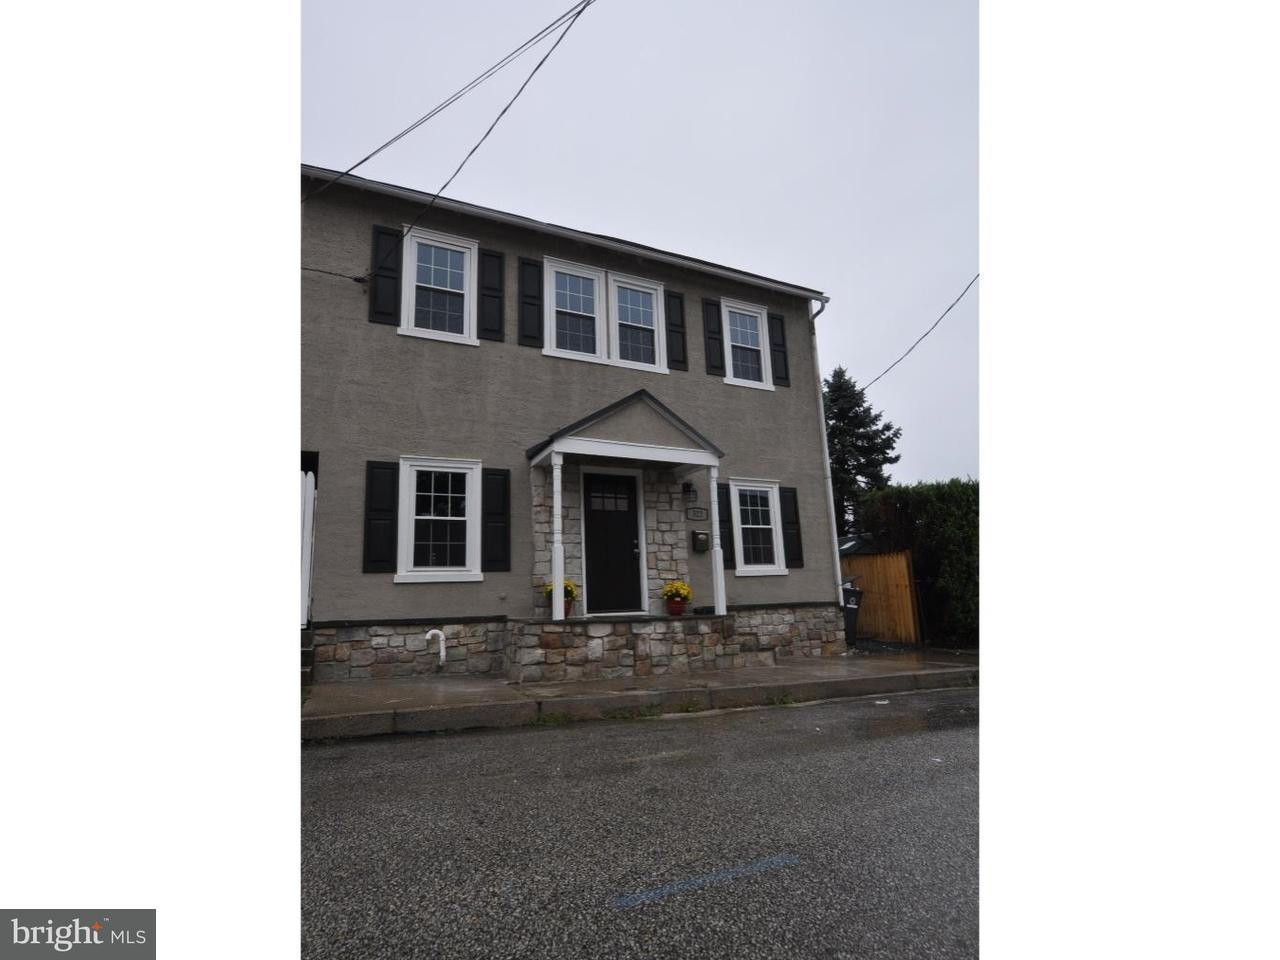 Casa unifamiliar adosada (Townhouse) por un Alquiler en 322 WALNUT Street Phoenixville, Pennsylvania 19460 Estados Unidos